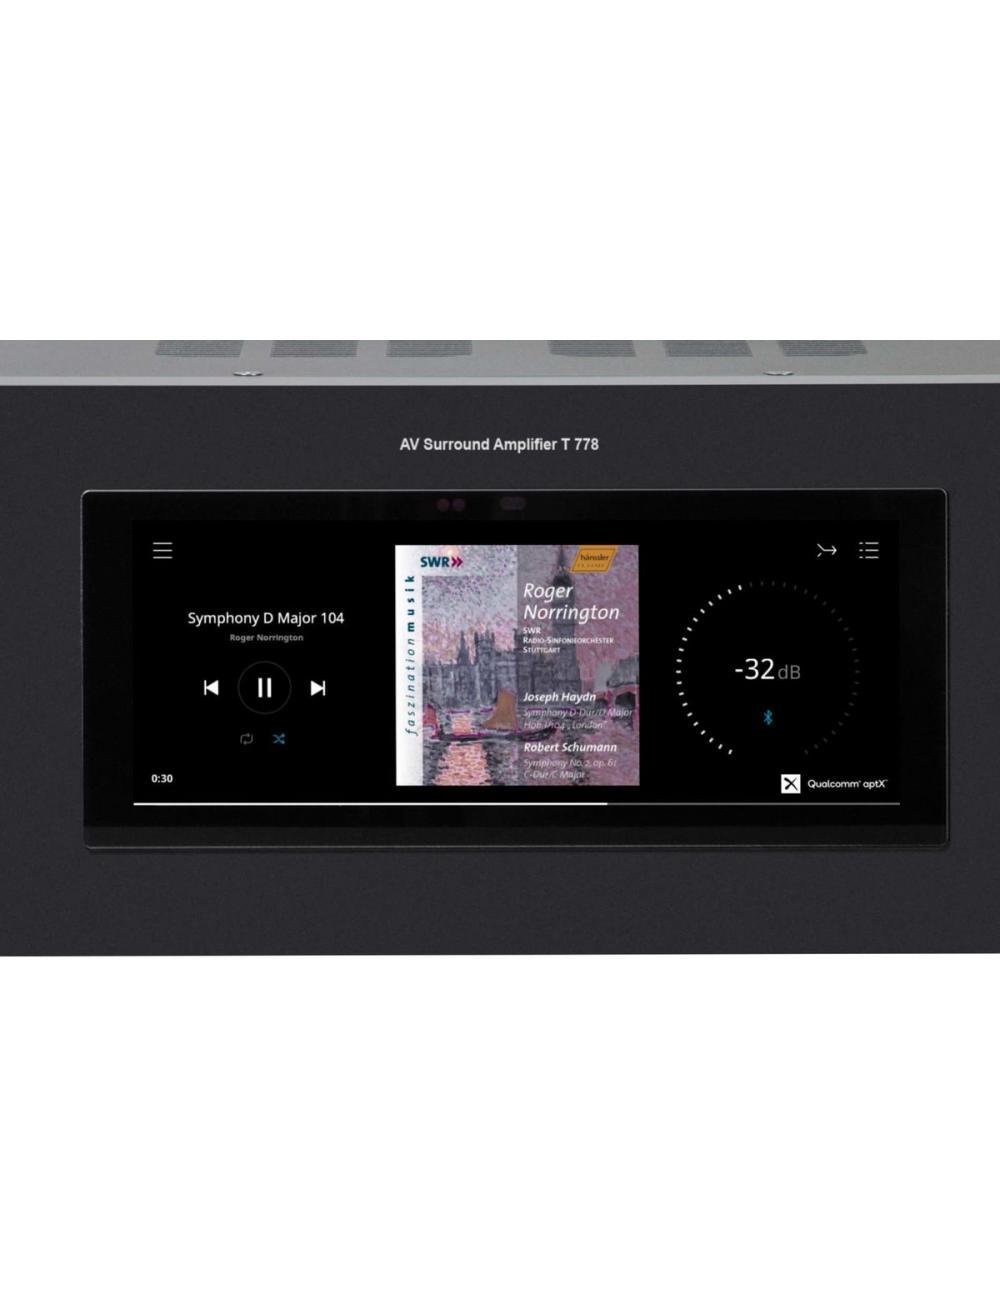 sintoamplificatore audio video multicanale, NAD T 778, vista frontale dettaglio display